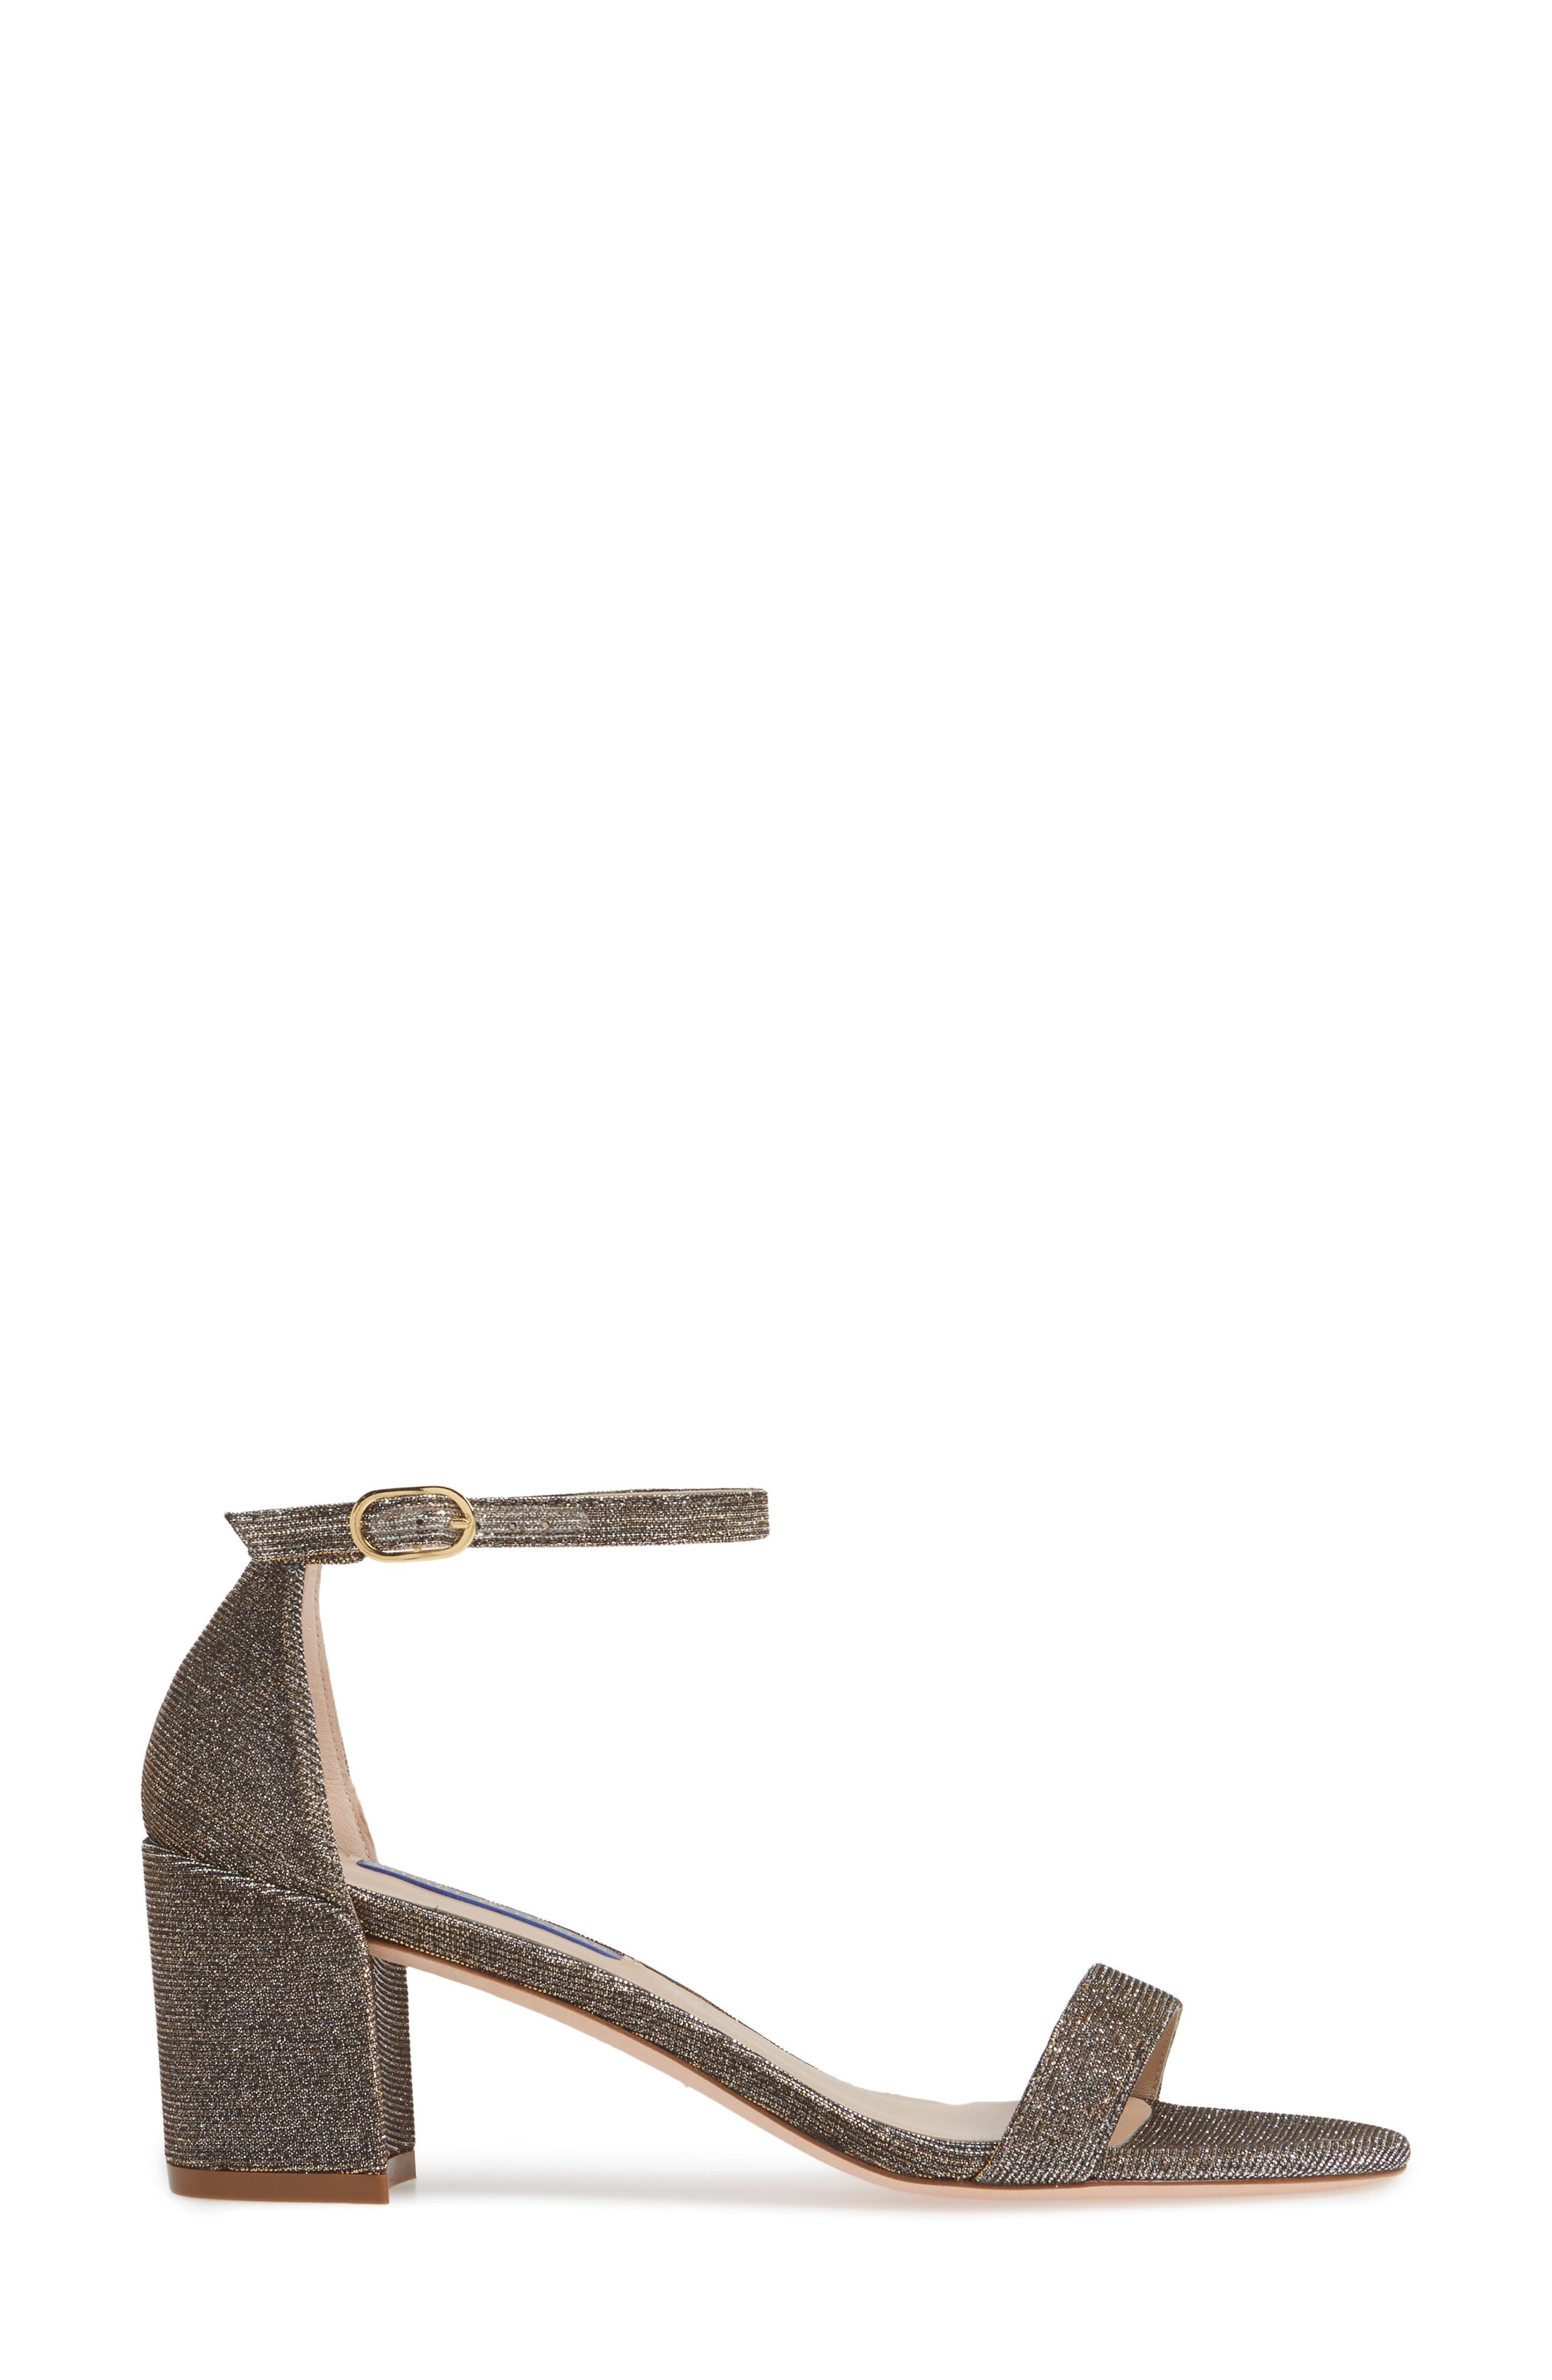 STUART WEITZMAN,                             Simple Ankle Strap Sandal,                             Alternate thumbnail 3, color,                             GOLD NIGHTTIME